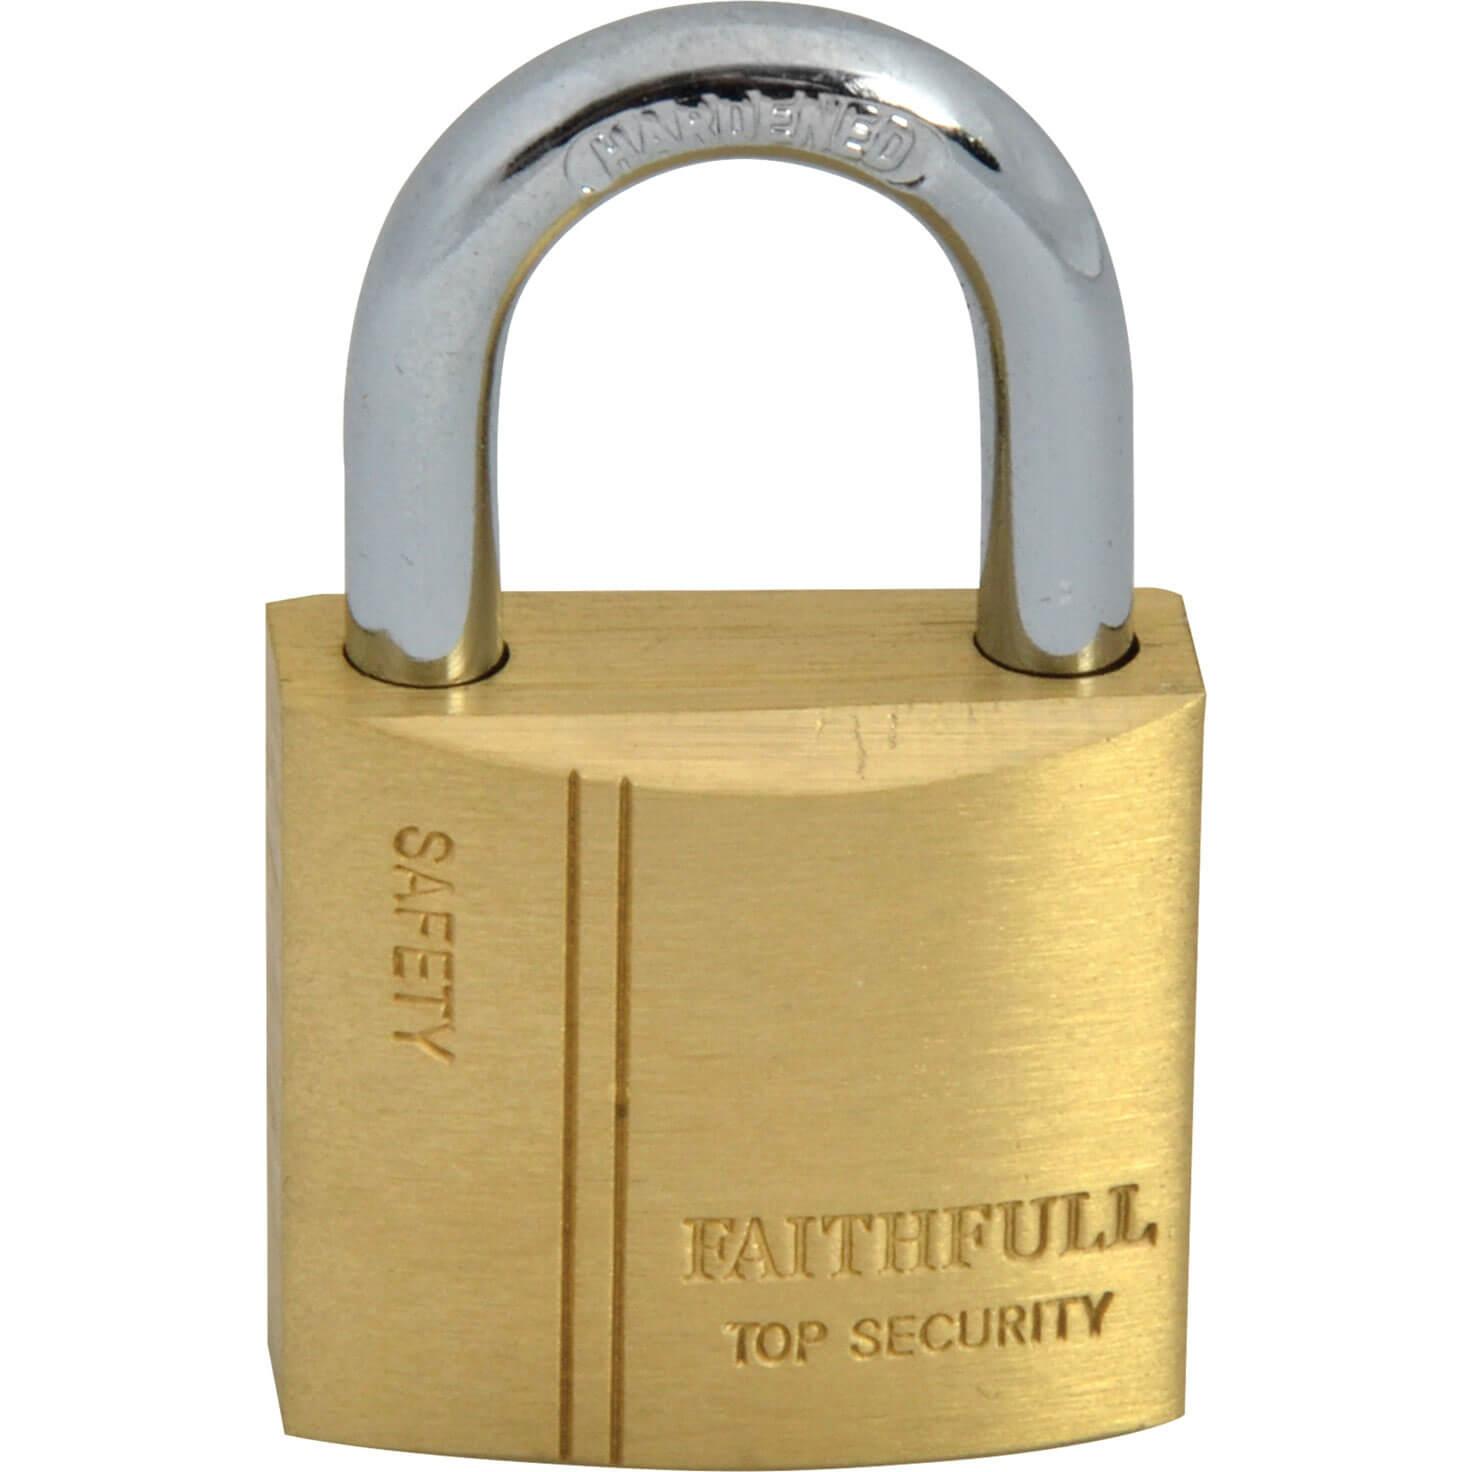 Tooled Up/Ironmongery & Security/Security/Faithfull 30mm Brass Padlock